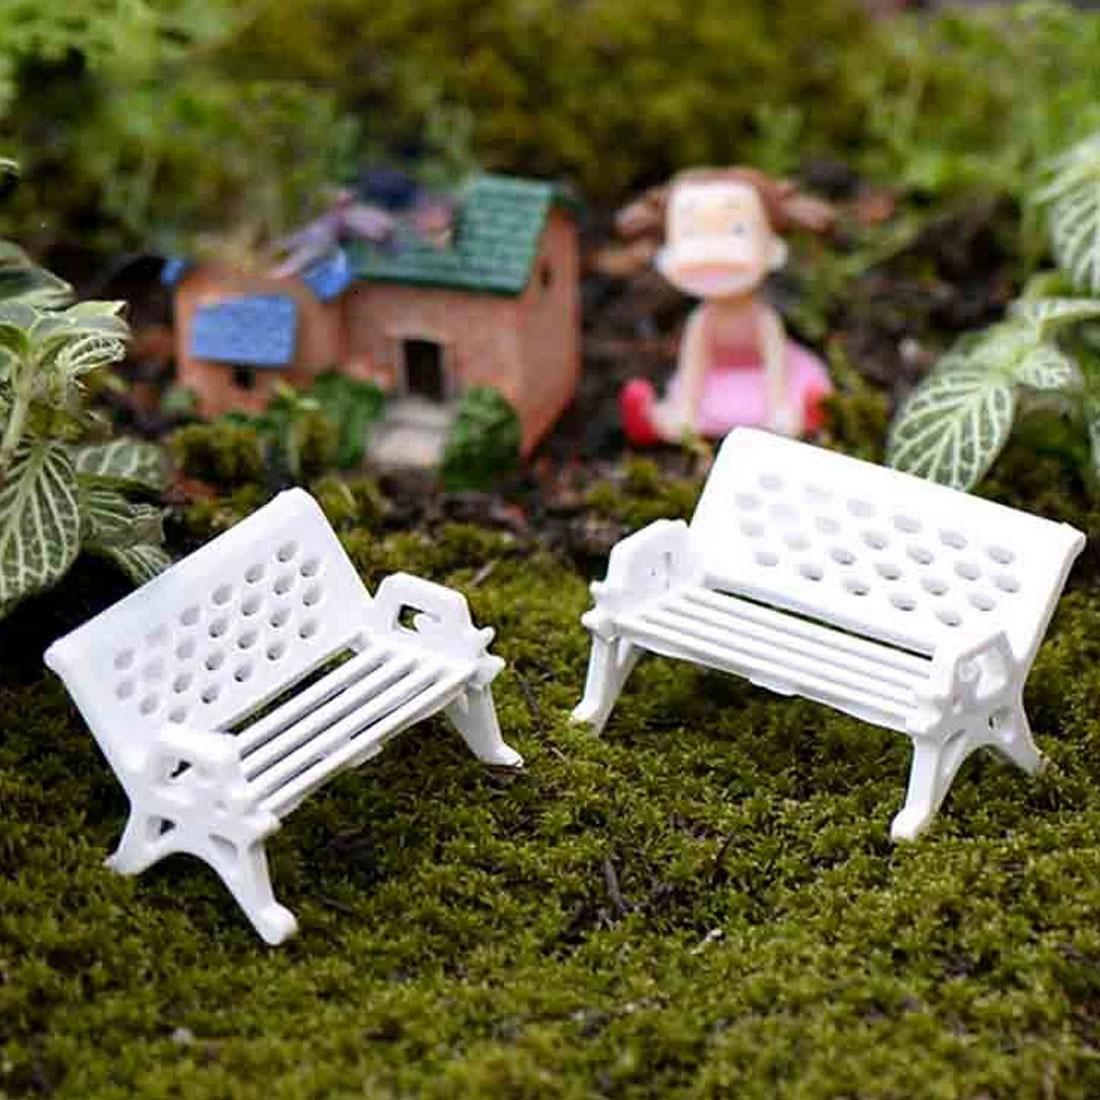 2Pcs white chair bench doll house miniatures lovely cute fairy garden gnome moss terrarium decor crafts bonsai DIY